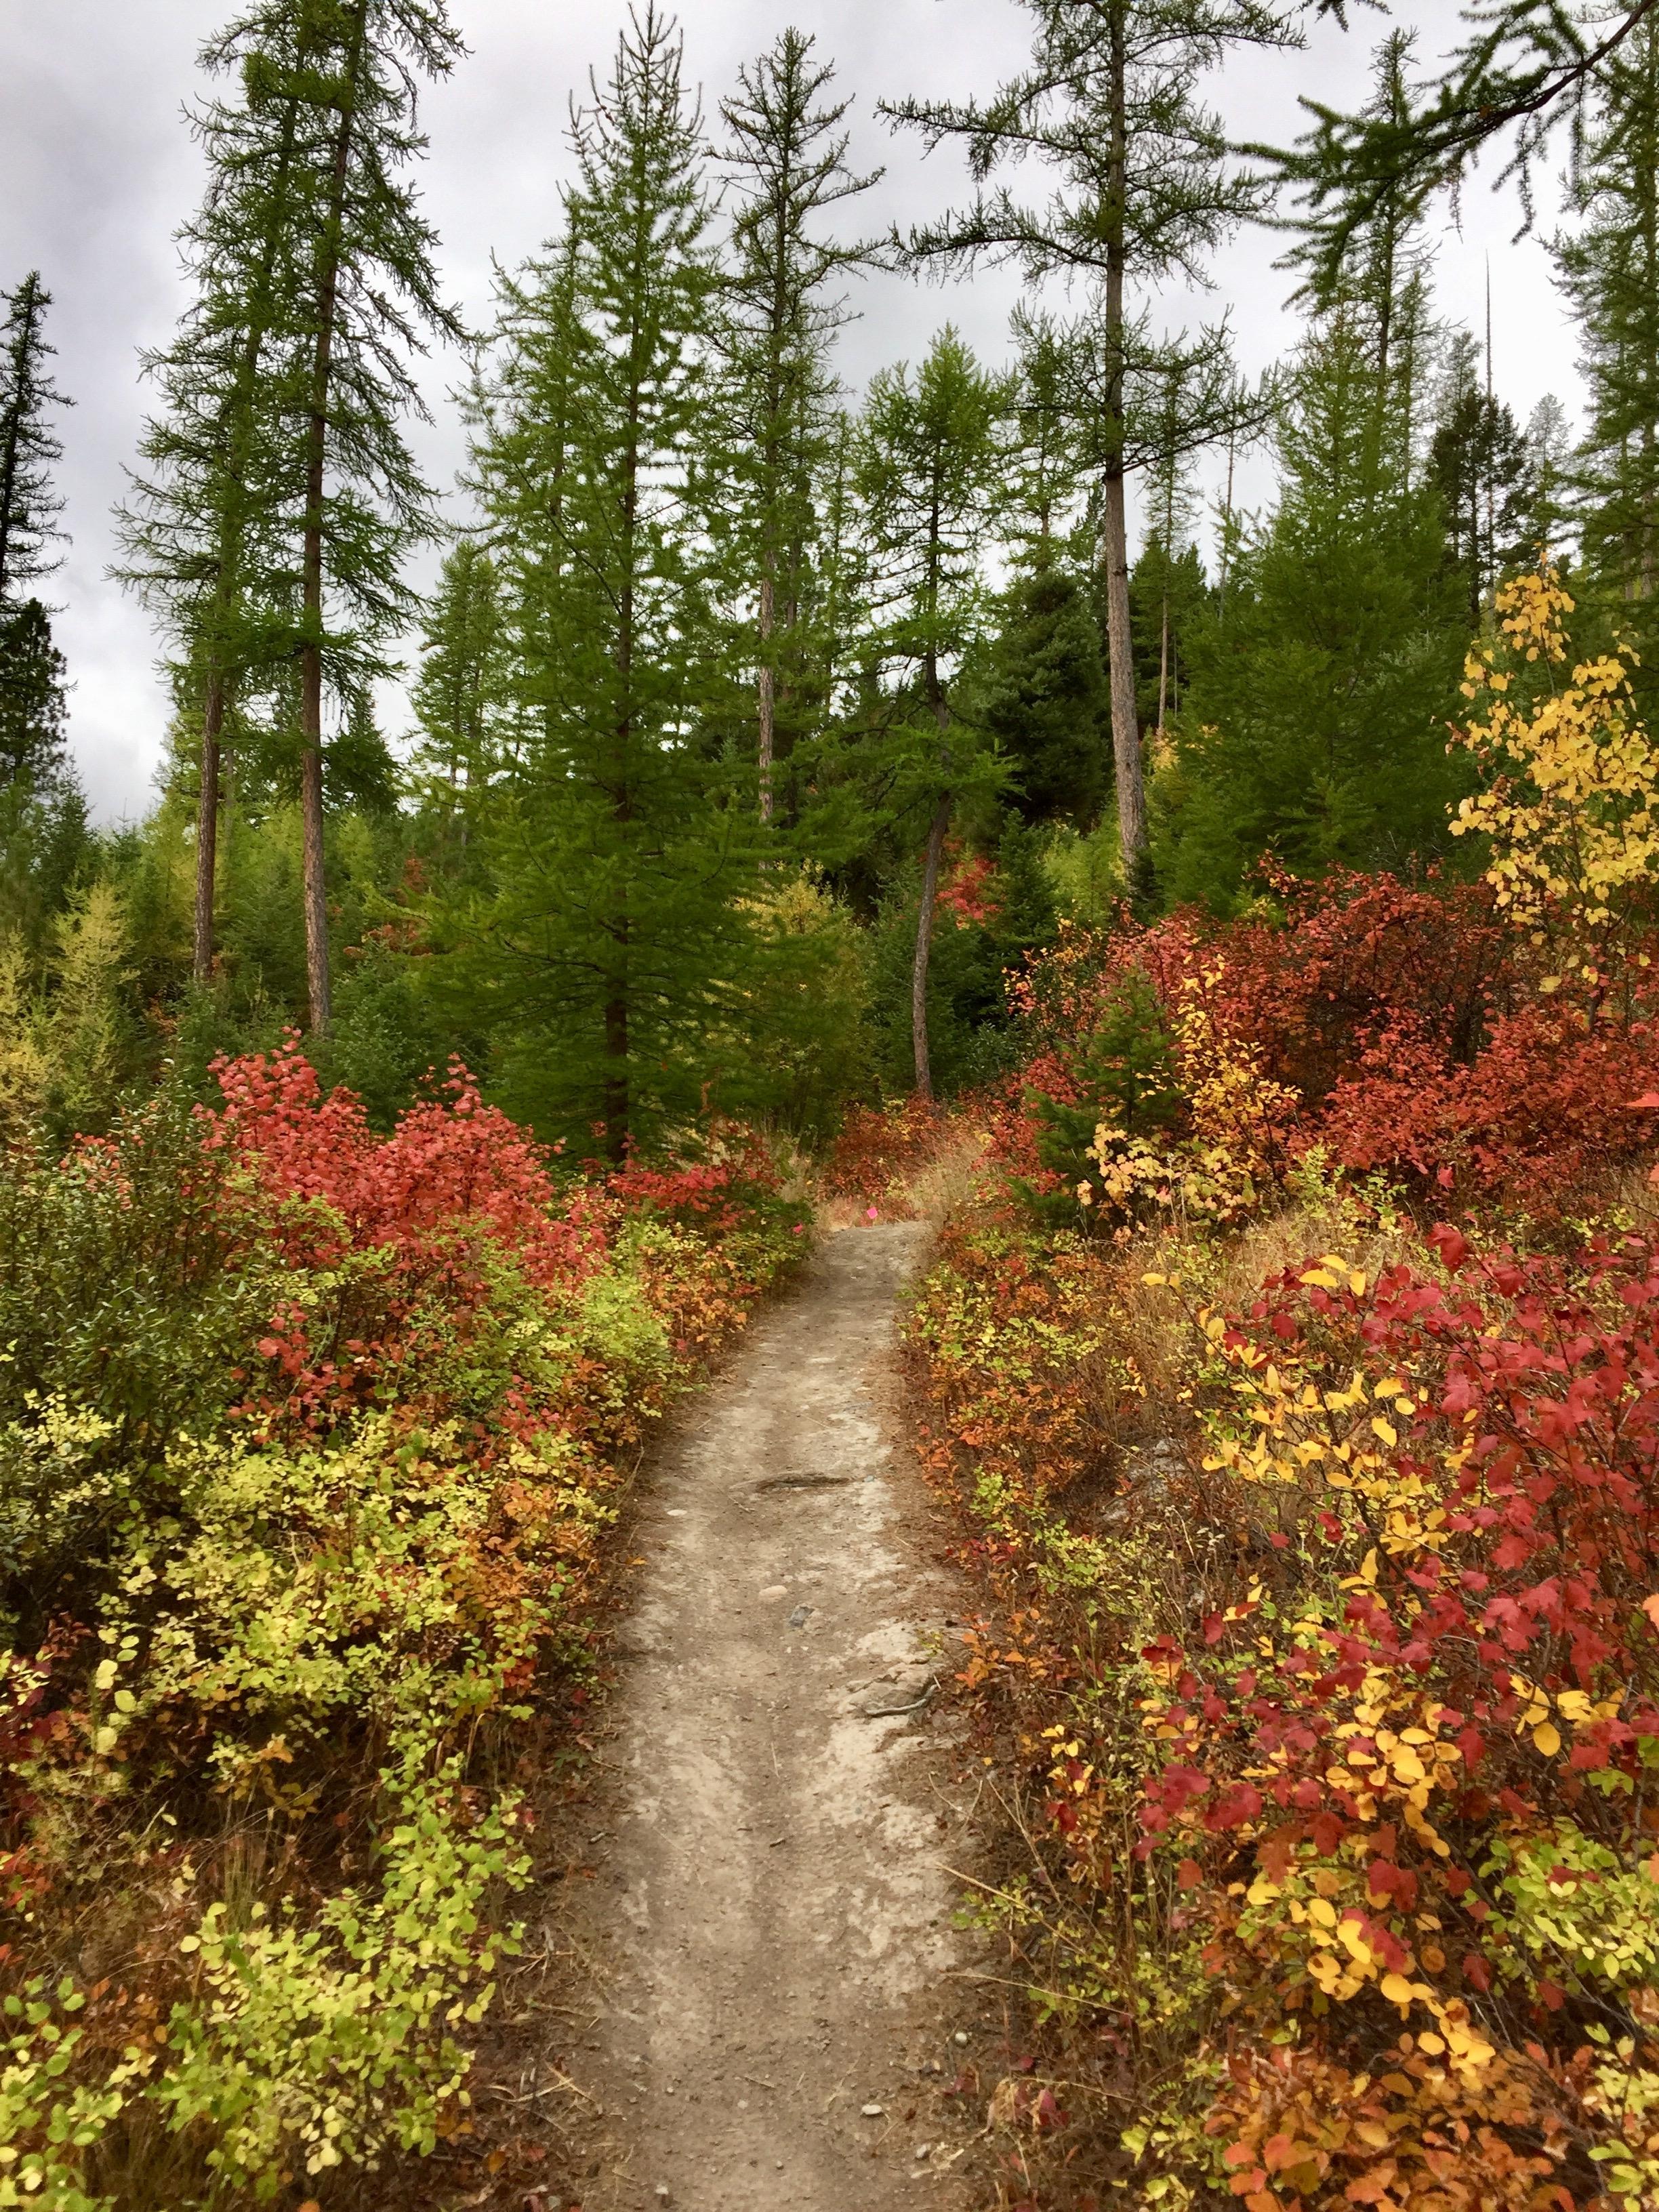 foys to blacktail trails trail marathon ftbtIMG_6652.JPG